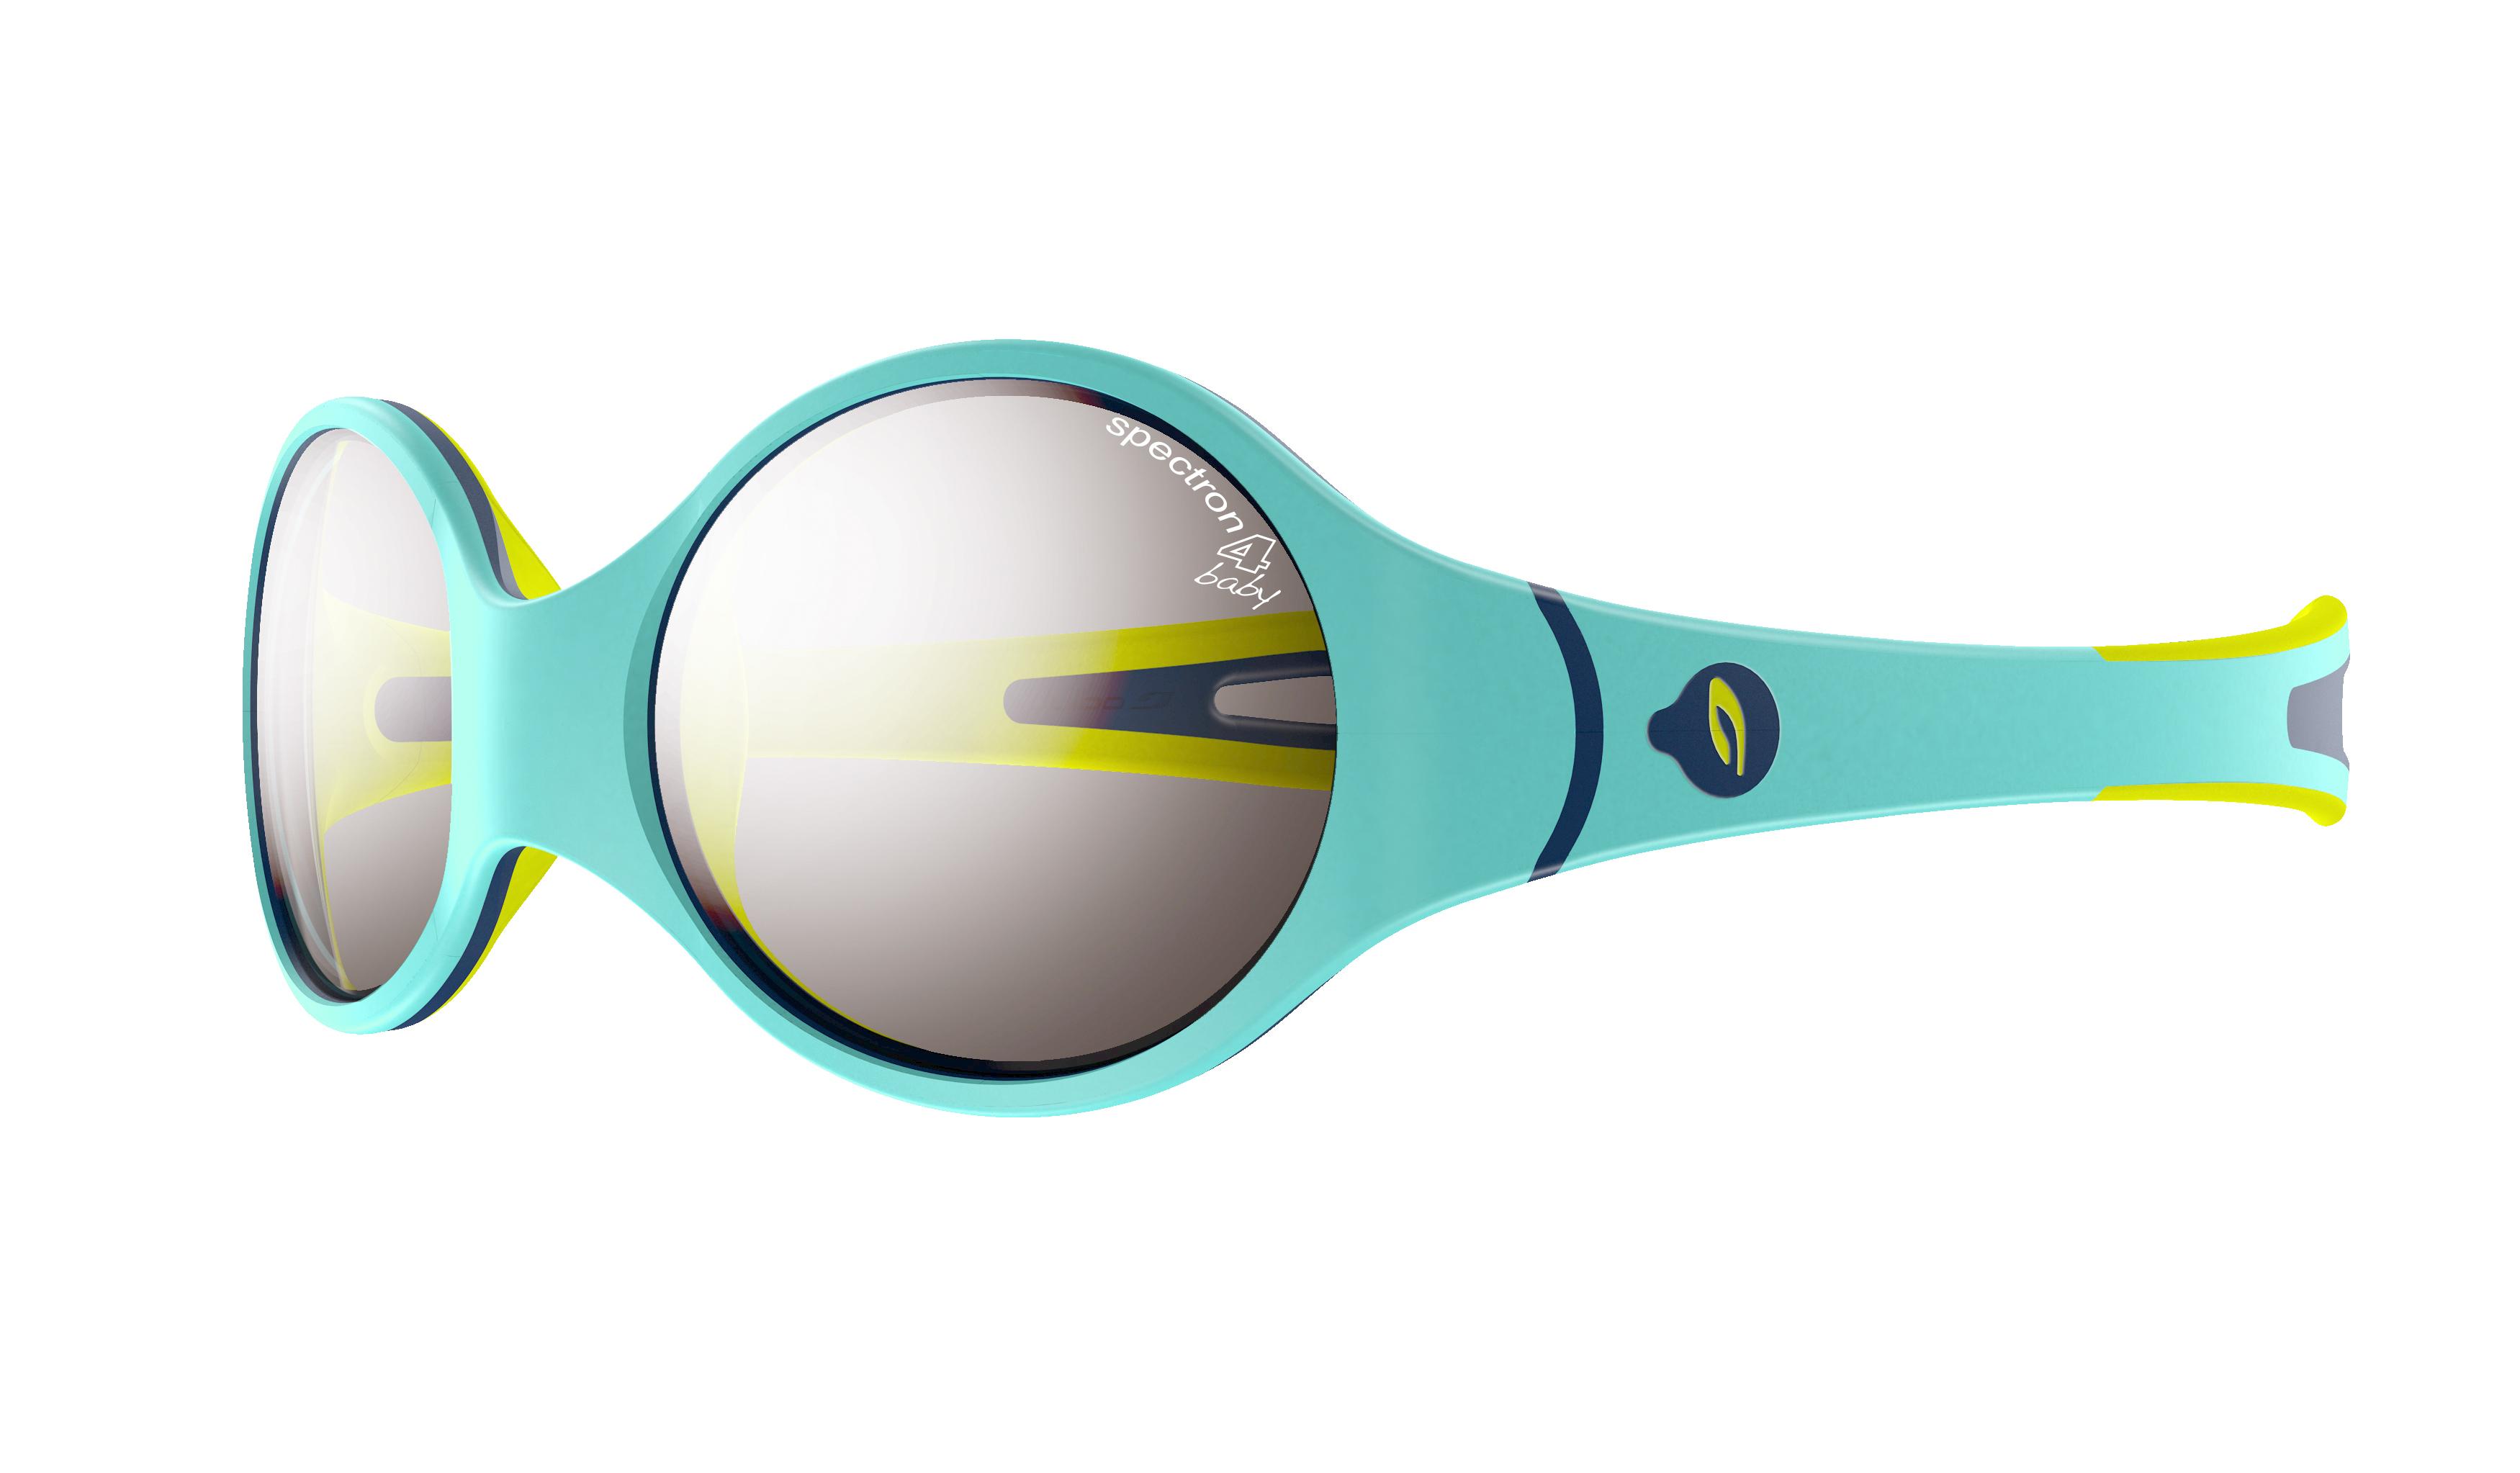 Julbo - Loop Spectron 4 Baby - Sunglasses - Kids (2-4 years old)